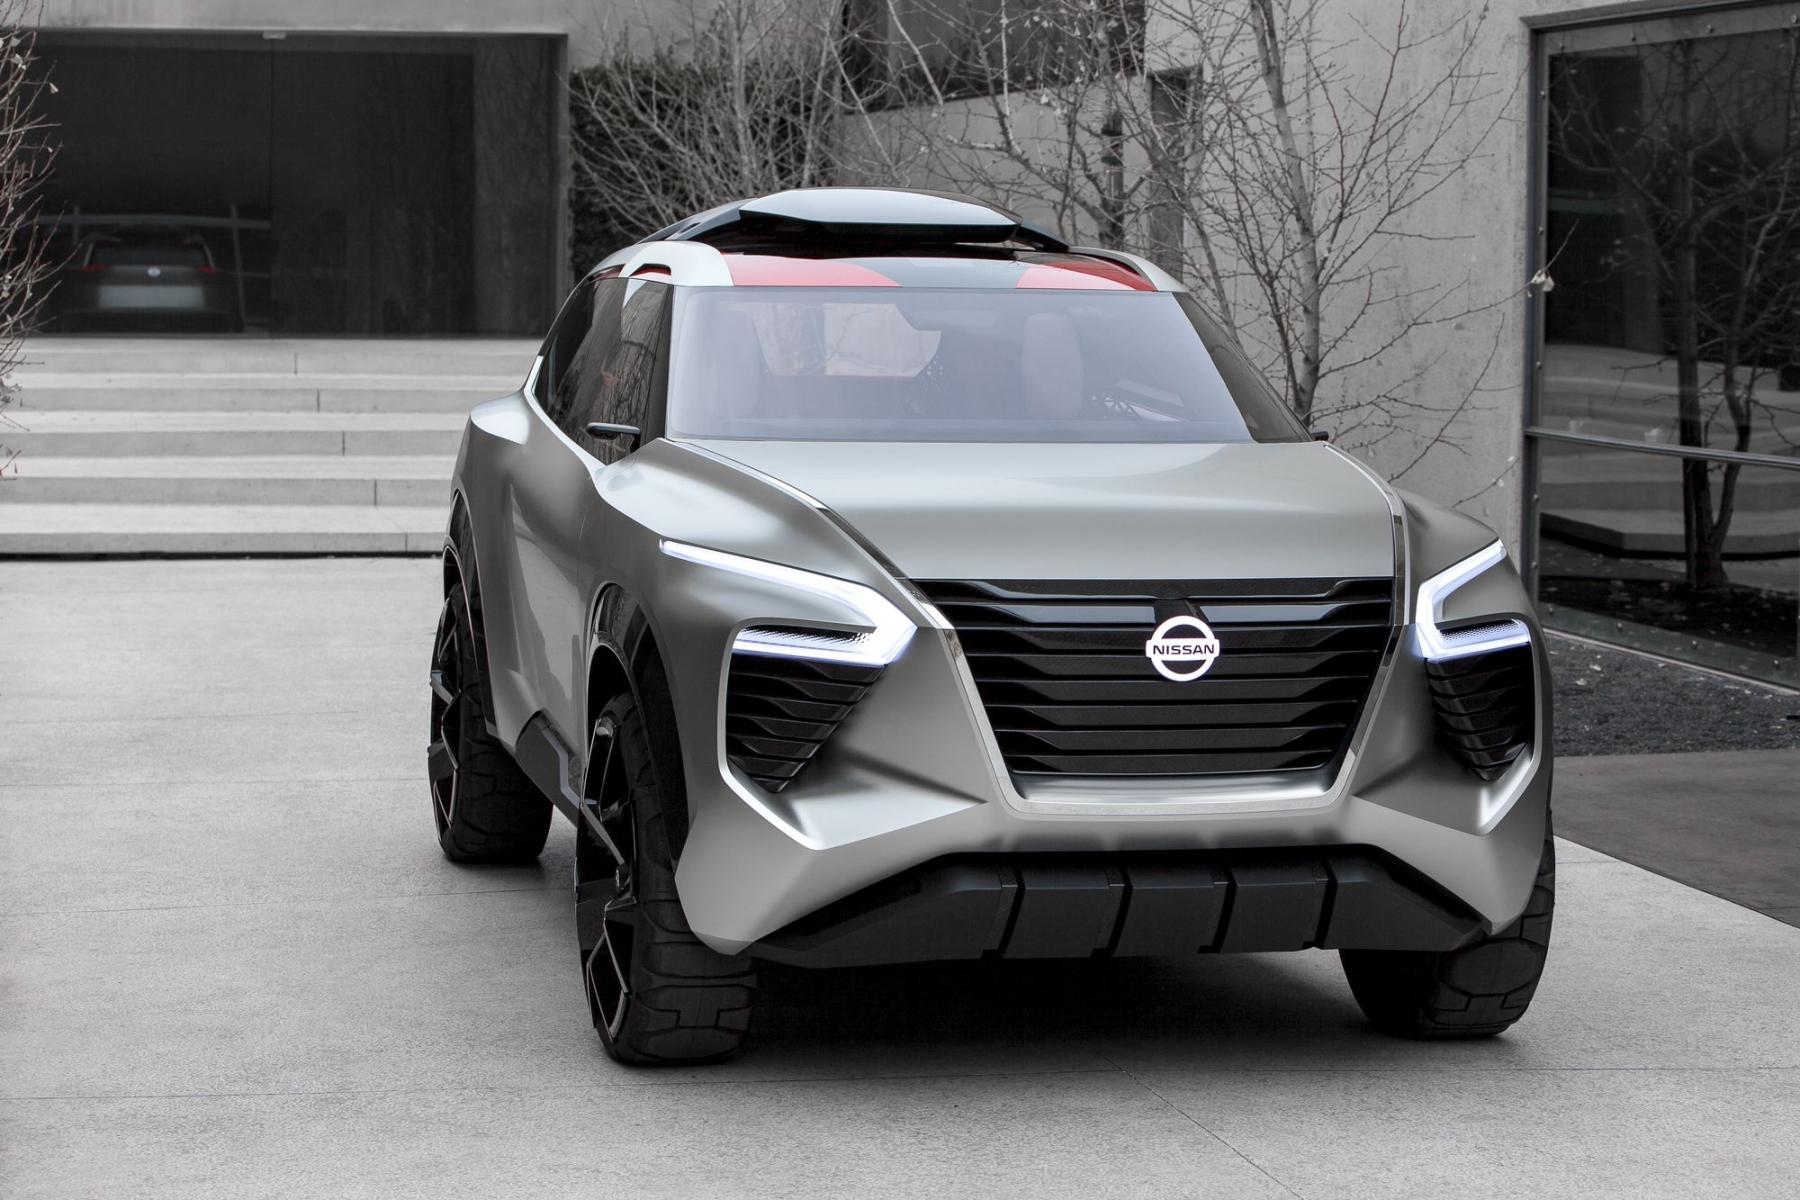 NissanXmotion_2018_07